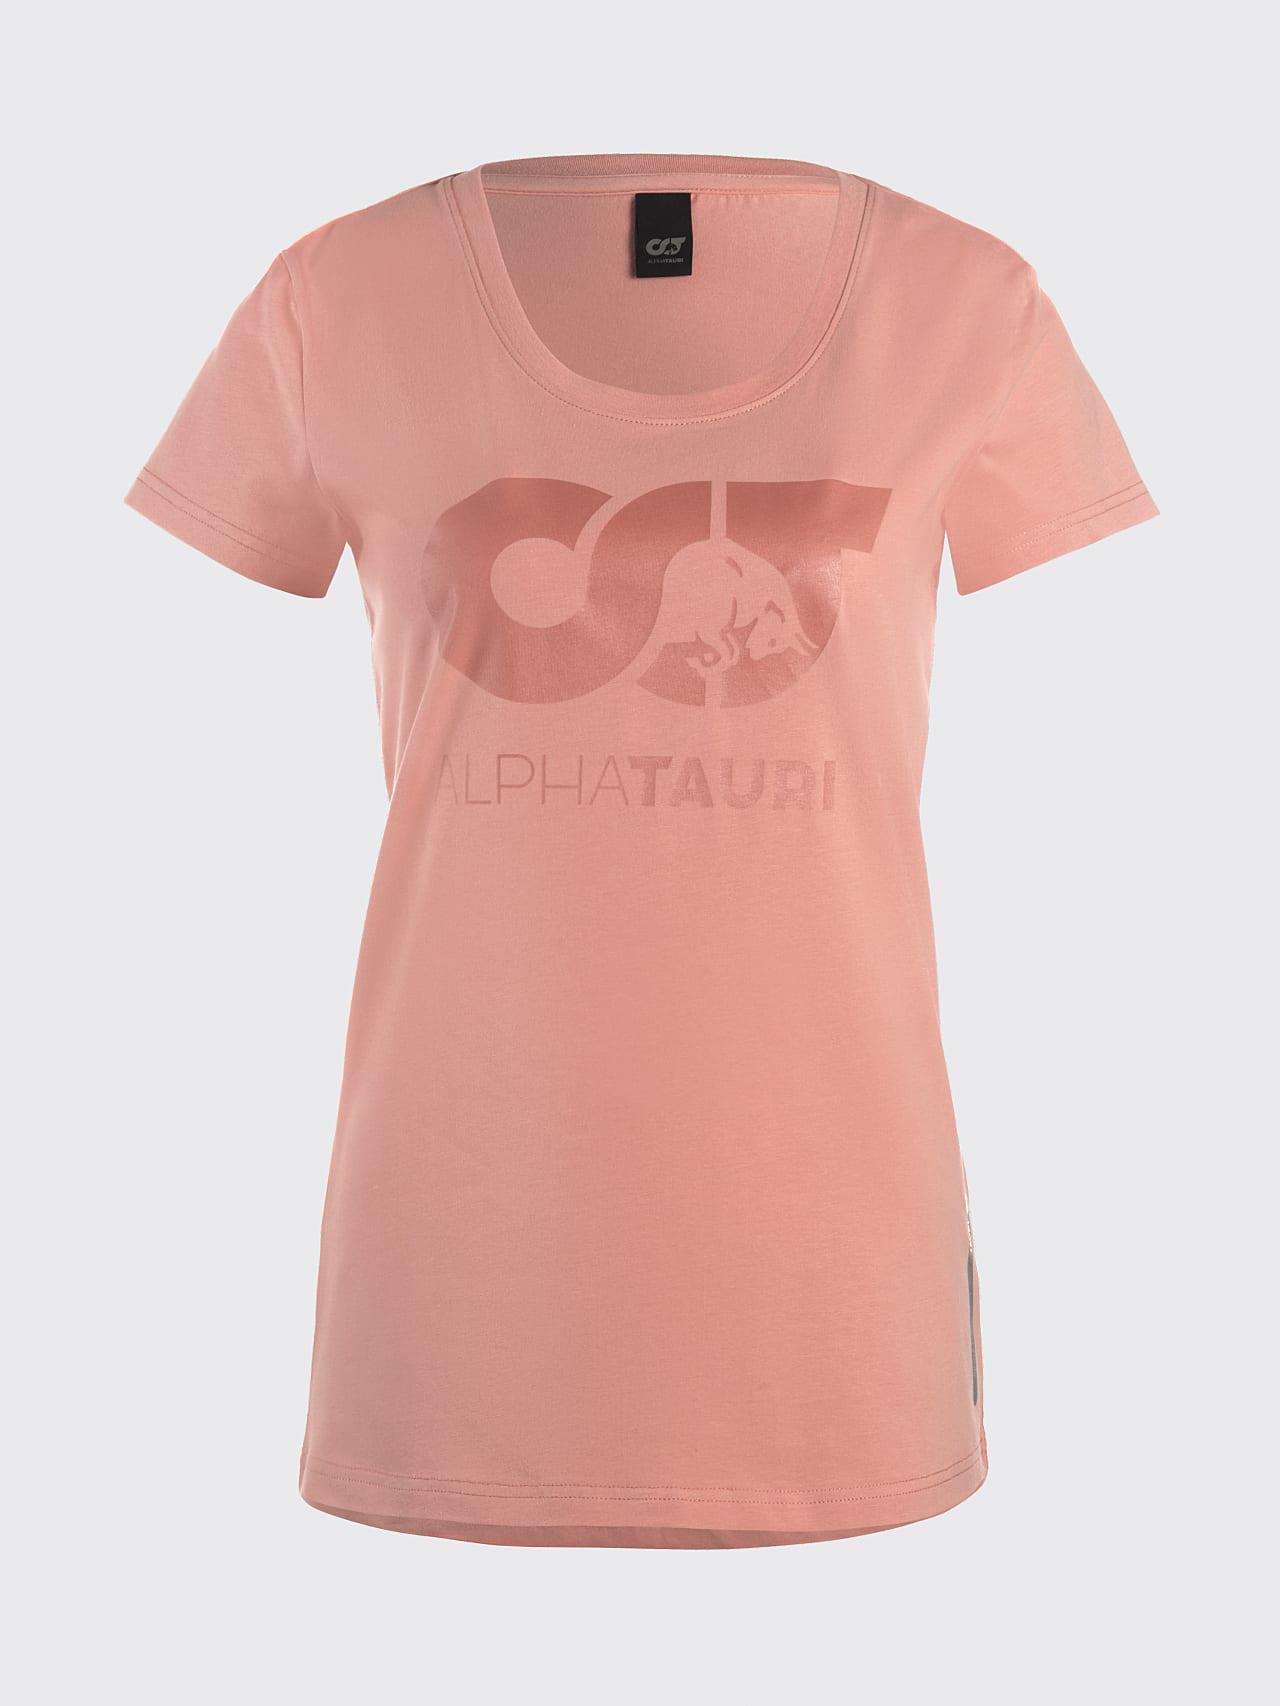 JERU V2.Y4.02 Signature Logo T-Shirt coral Back Alpha Tauri